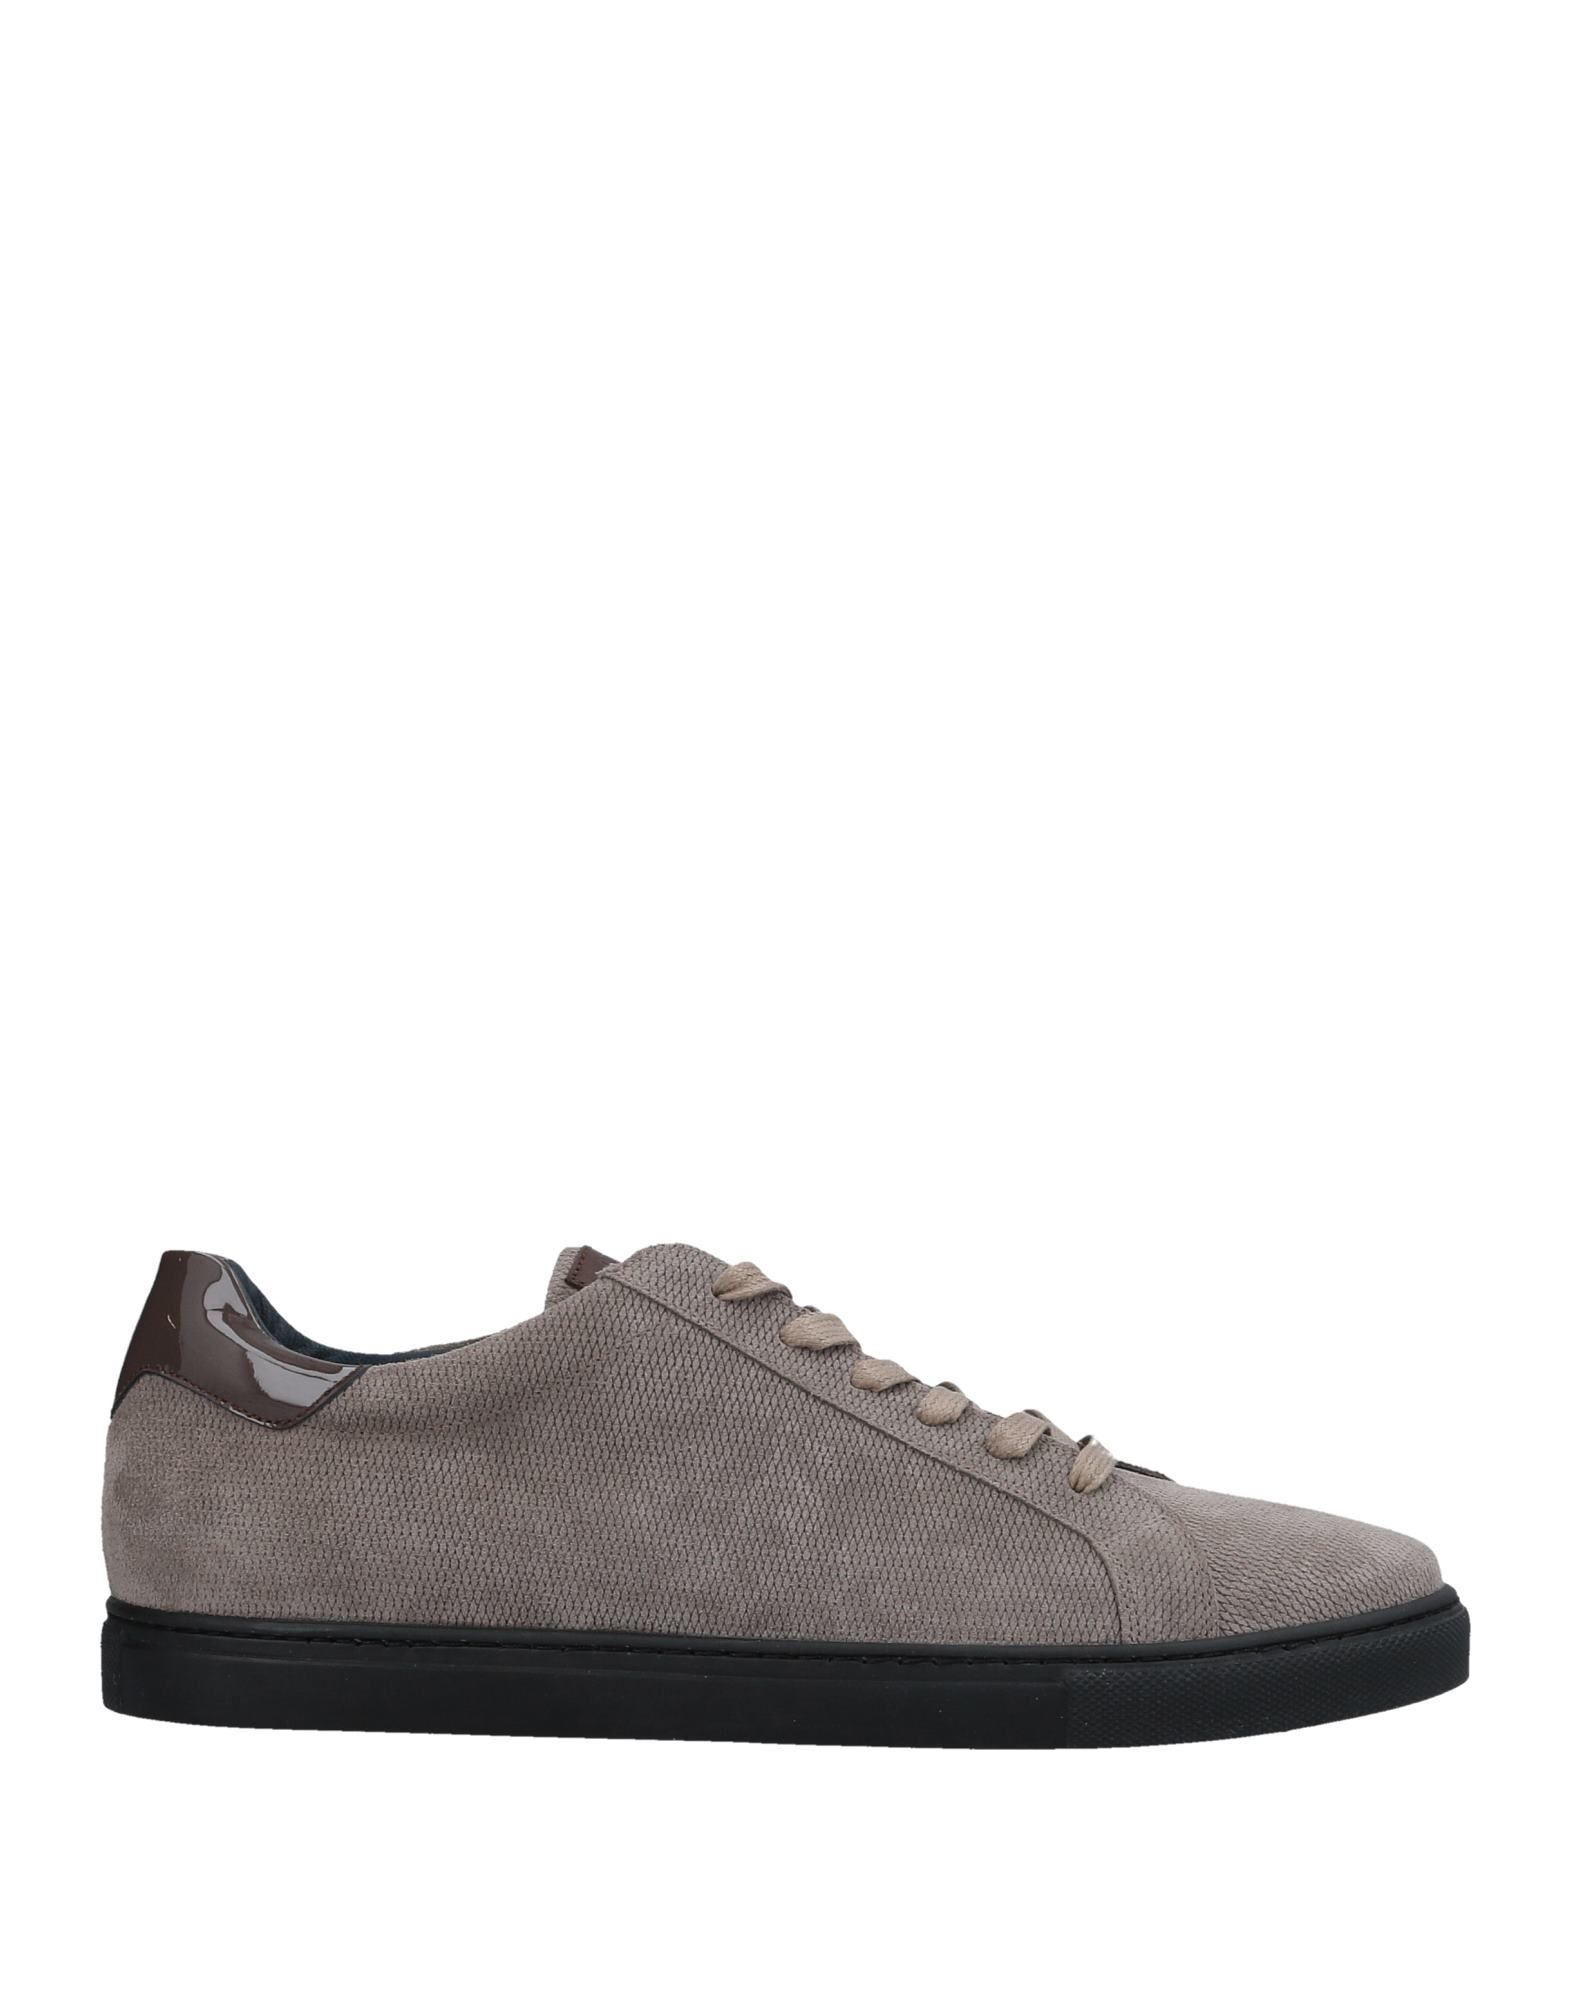 Fabiano Ricci Sneakers - Men on Fabiano Ricci Sneakers online on Men  Canada - 11508817AS 767517